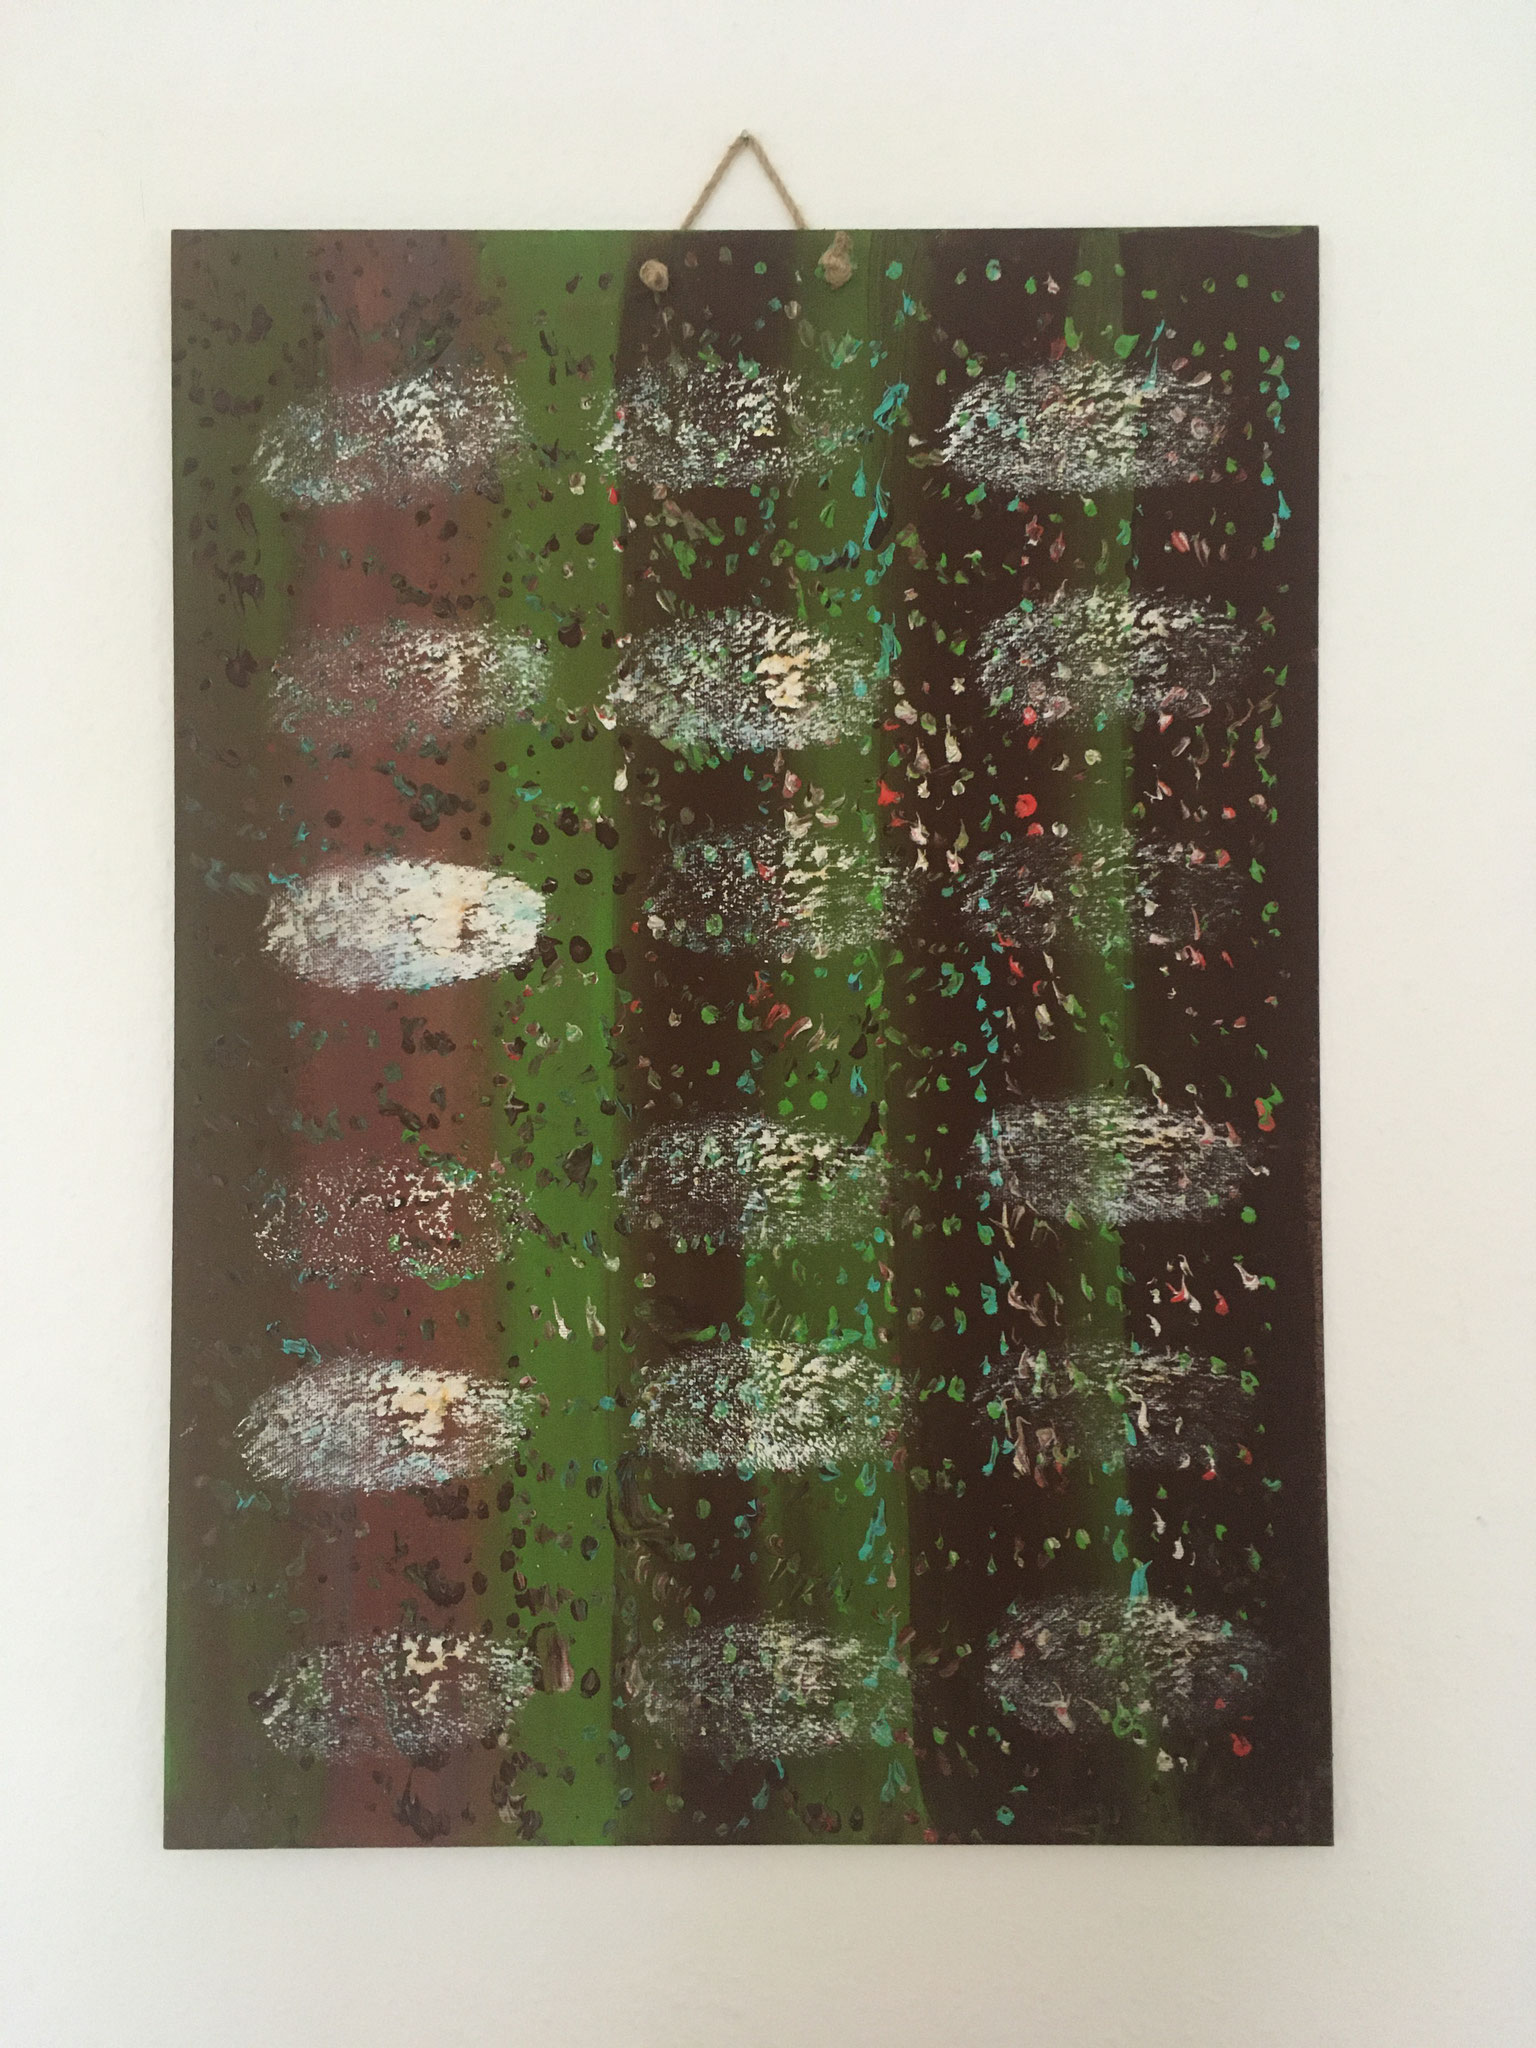 Holzweg & Schritte (70x50cm)